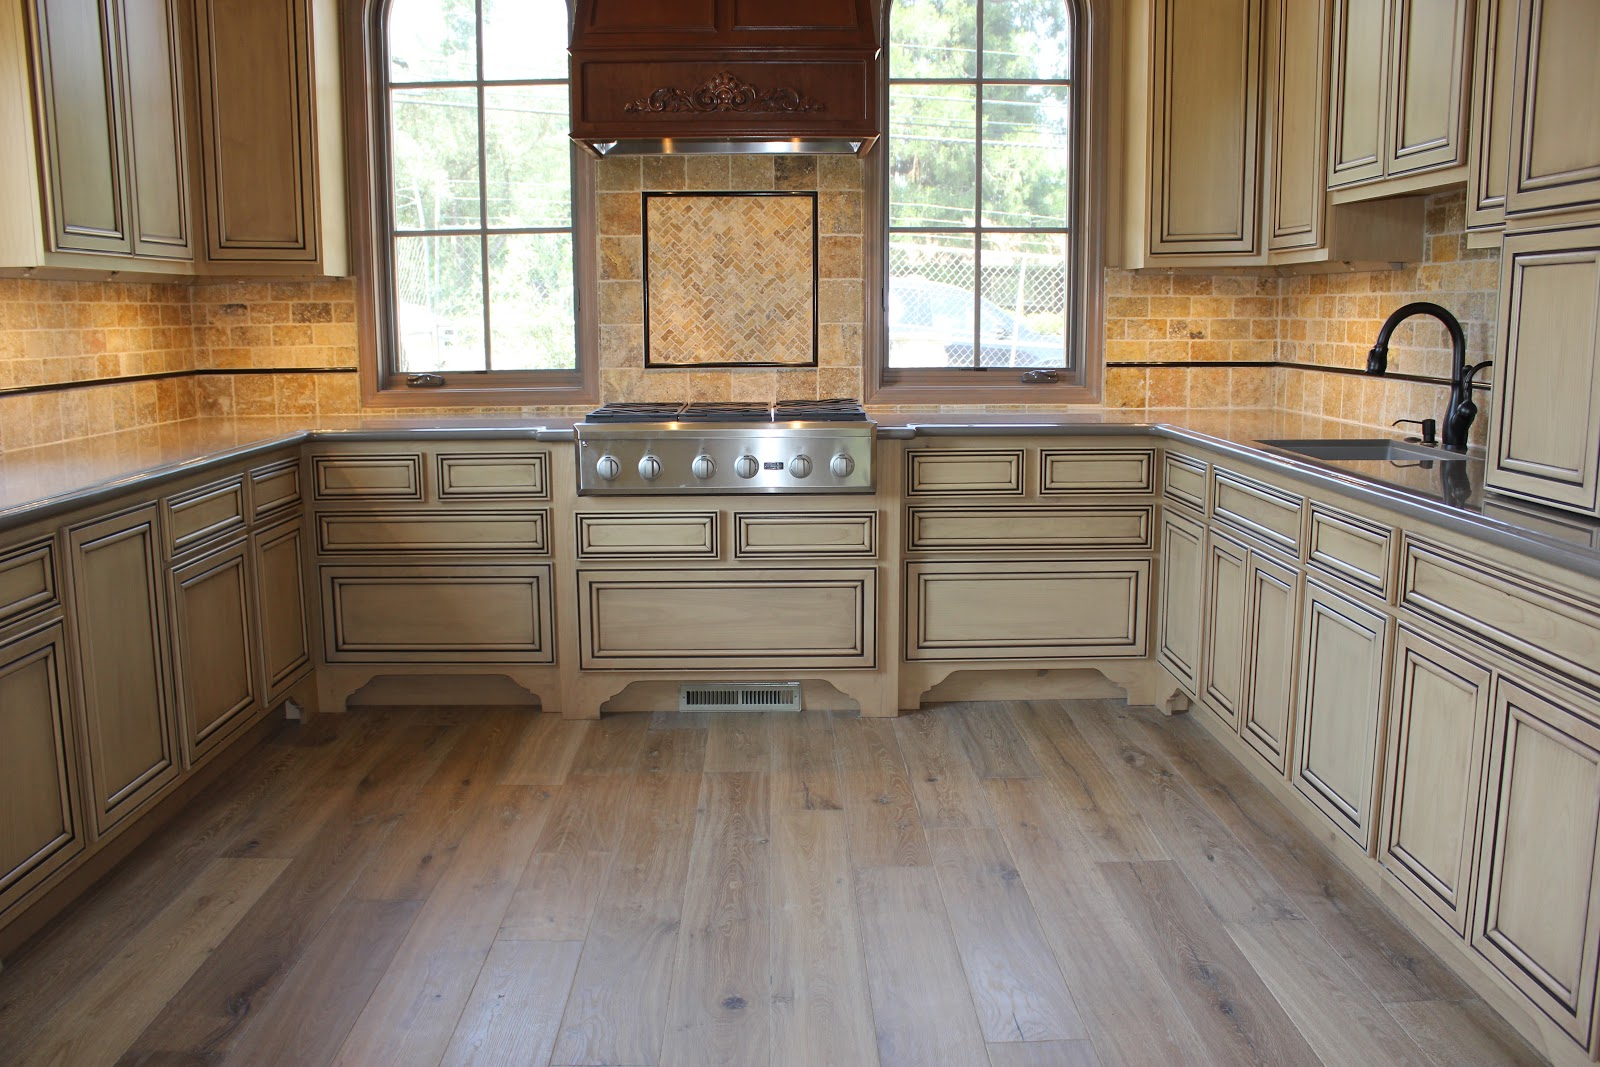 Wood Kitchen Floors Pot Rack Simas Floor And Design Company Hardwood Flooring By Royal Oak